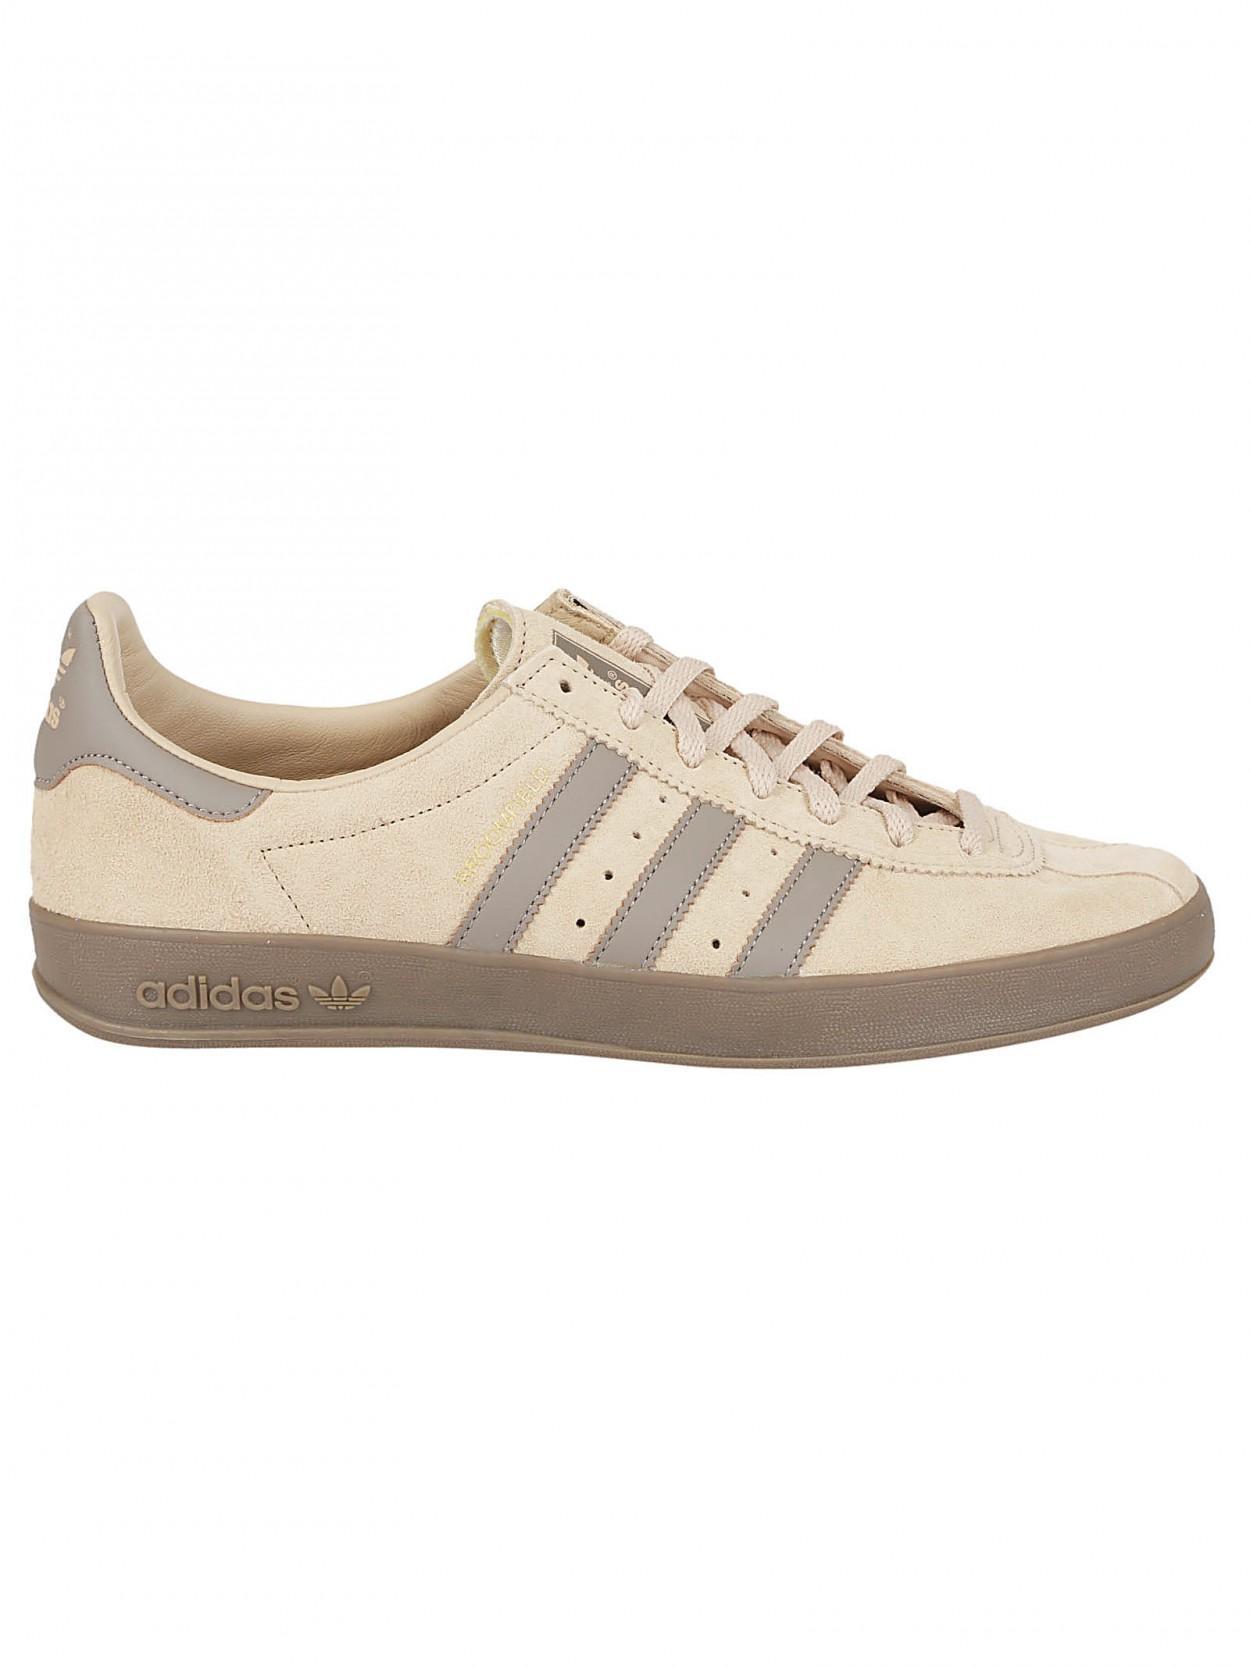 best service 67d79 8974a adidas Originals ADIDAS ORIGINALS Sneaker broomfield beige in Brown ...